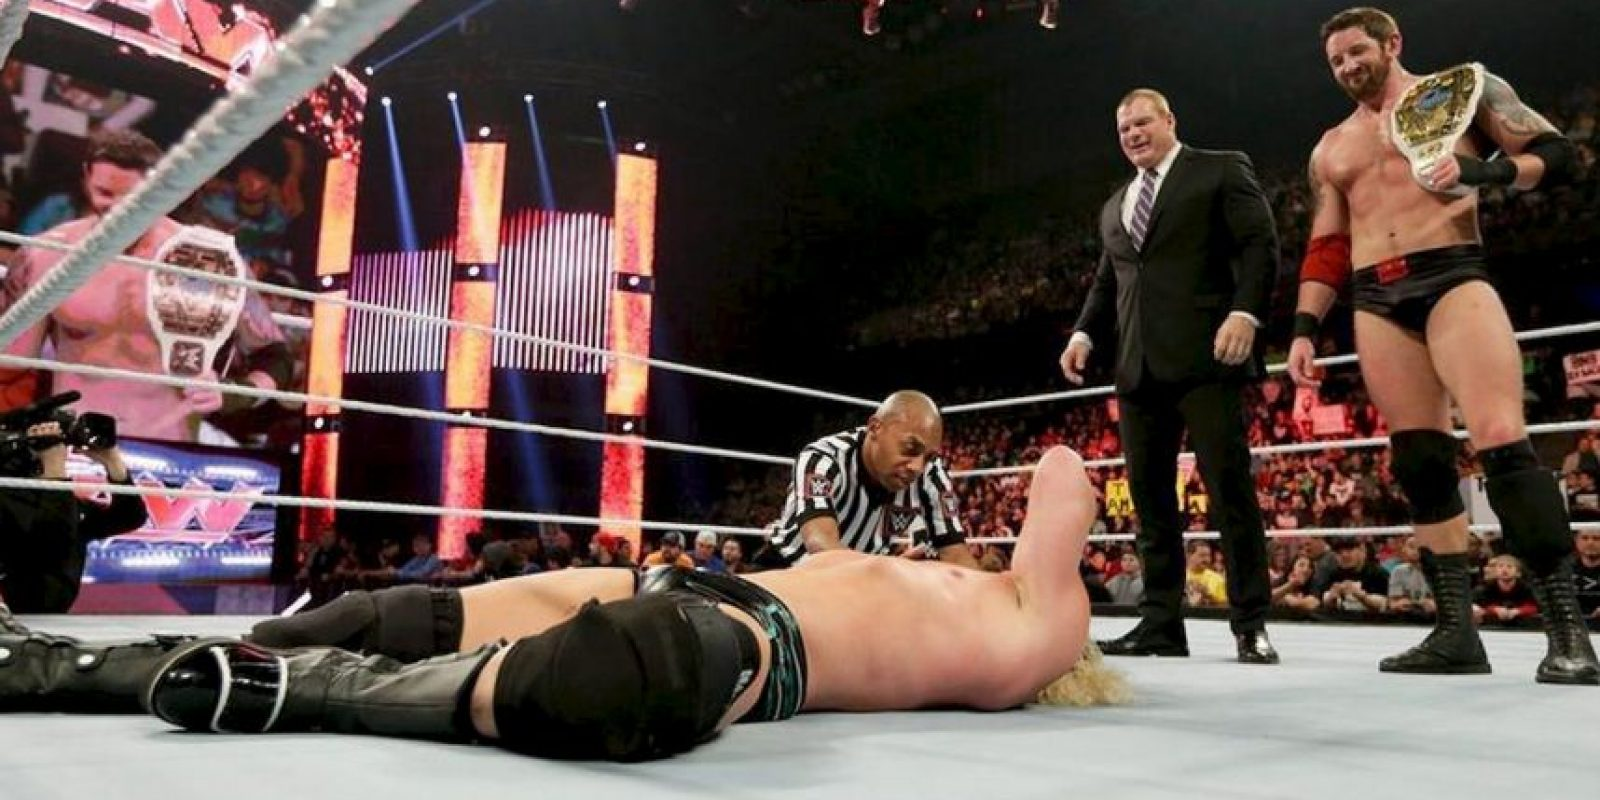 Barrett se molestó con un penal, que según él, Rooney fingió ante el Preston North End, en la FA Cup Foto:WWE